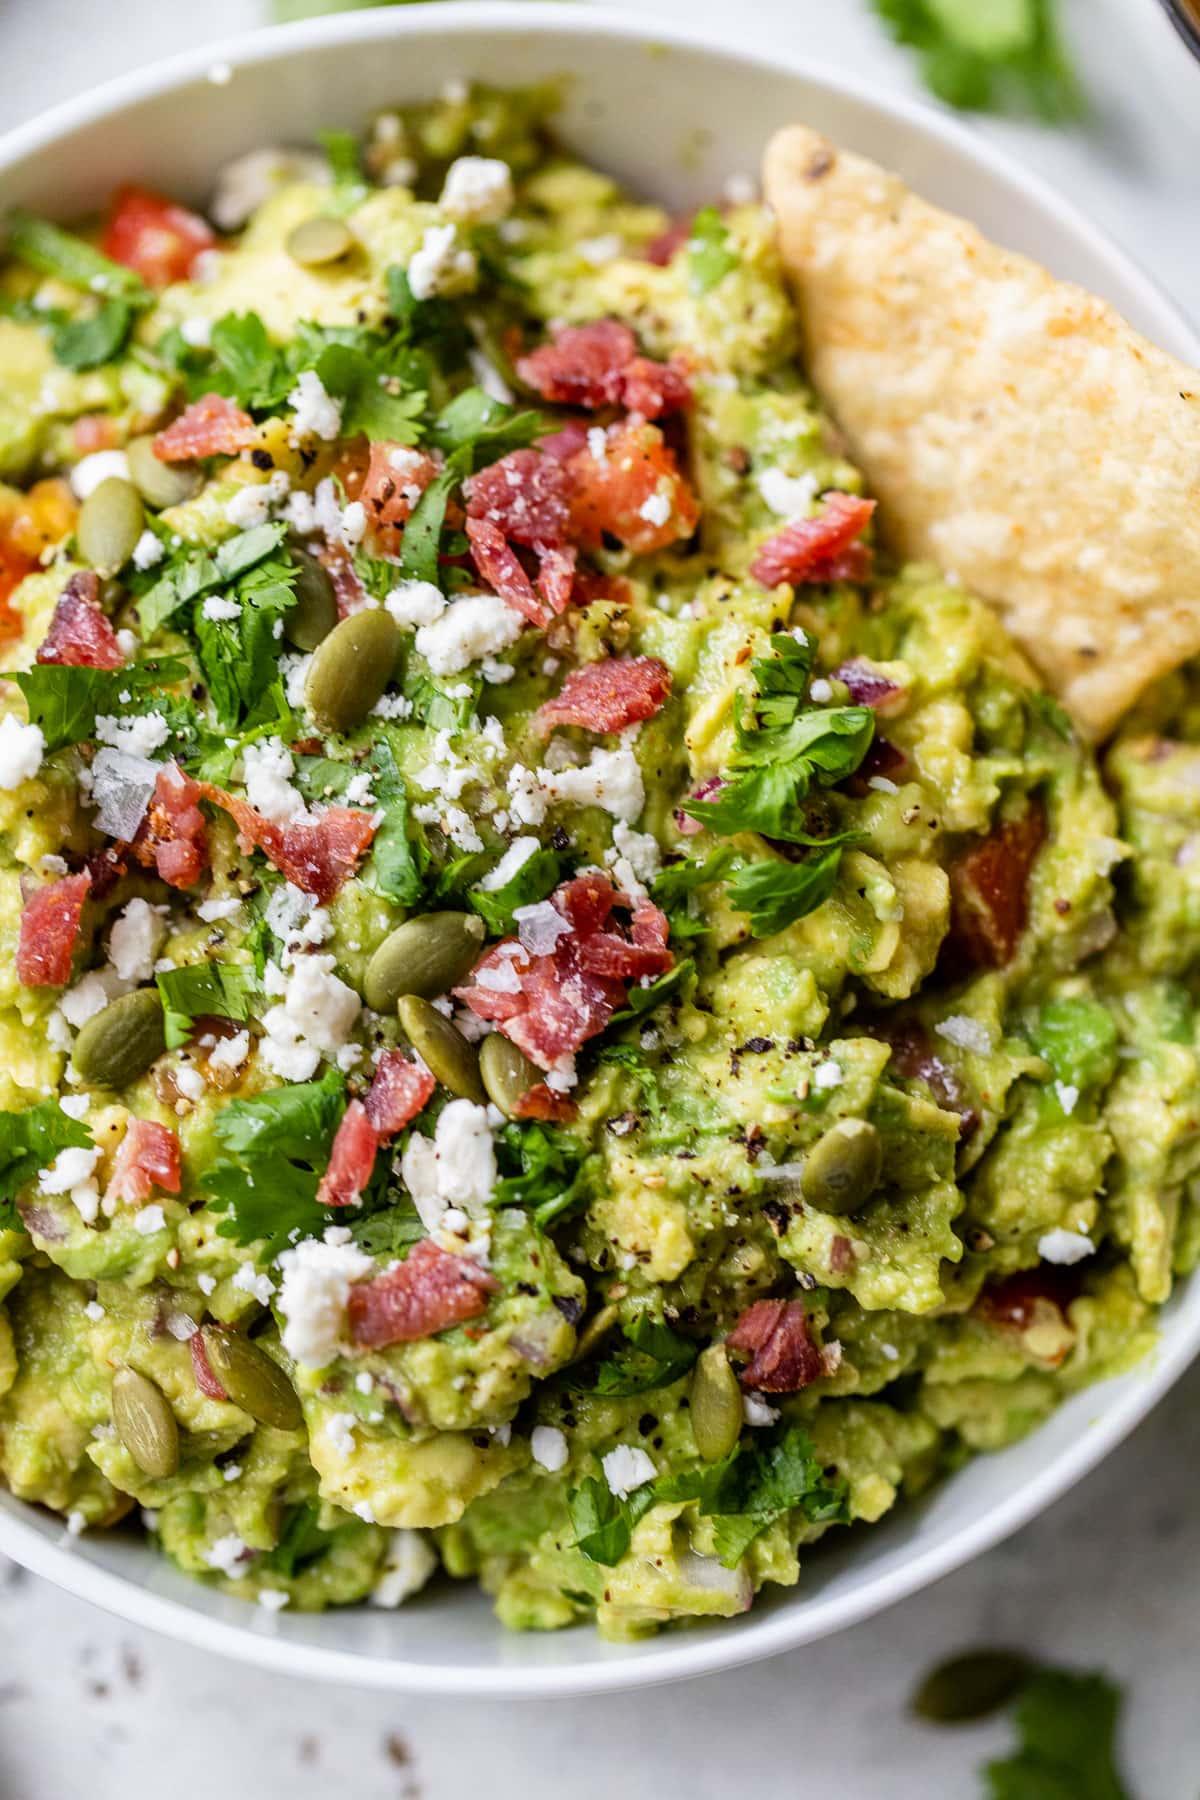 Healthy homemade guacamole in a bowl